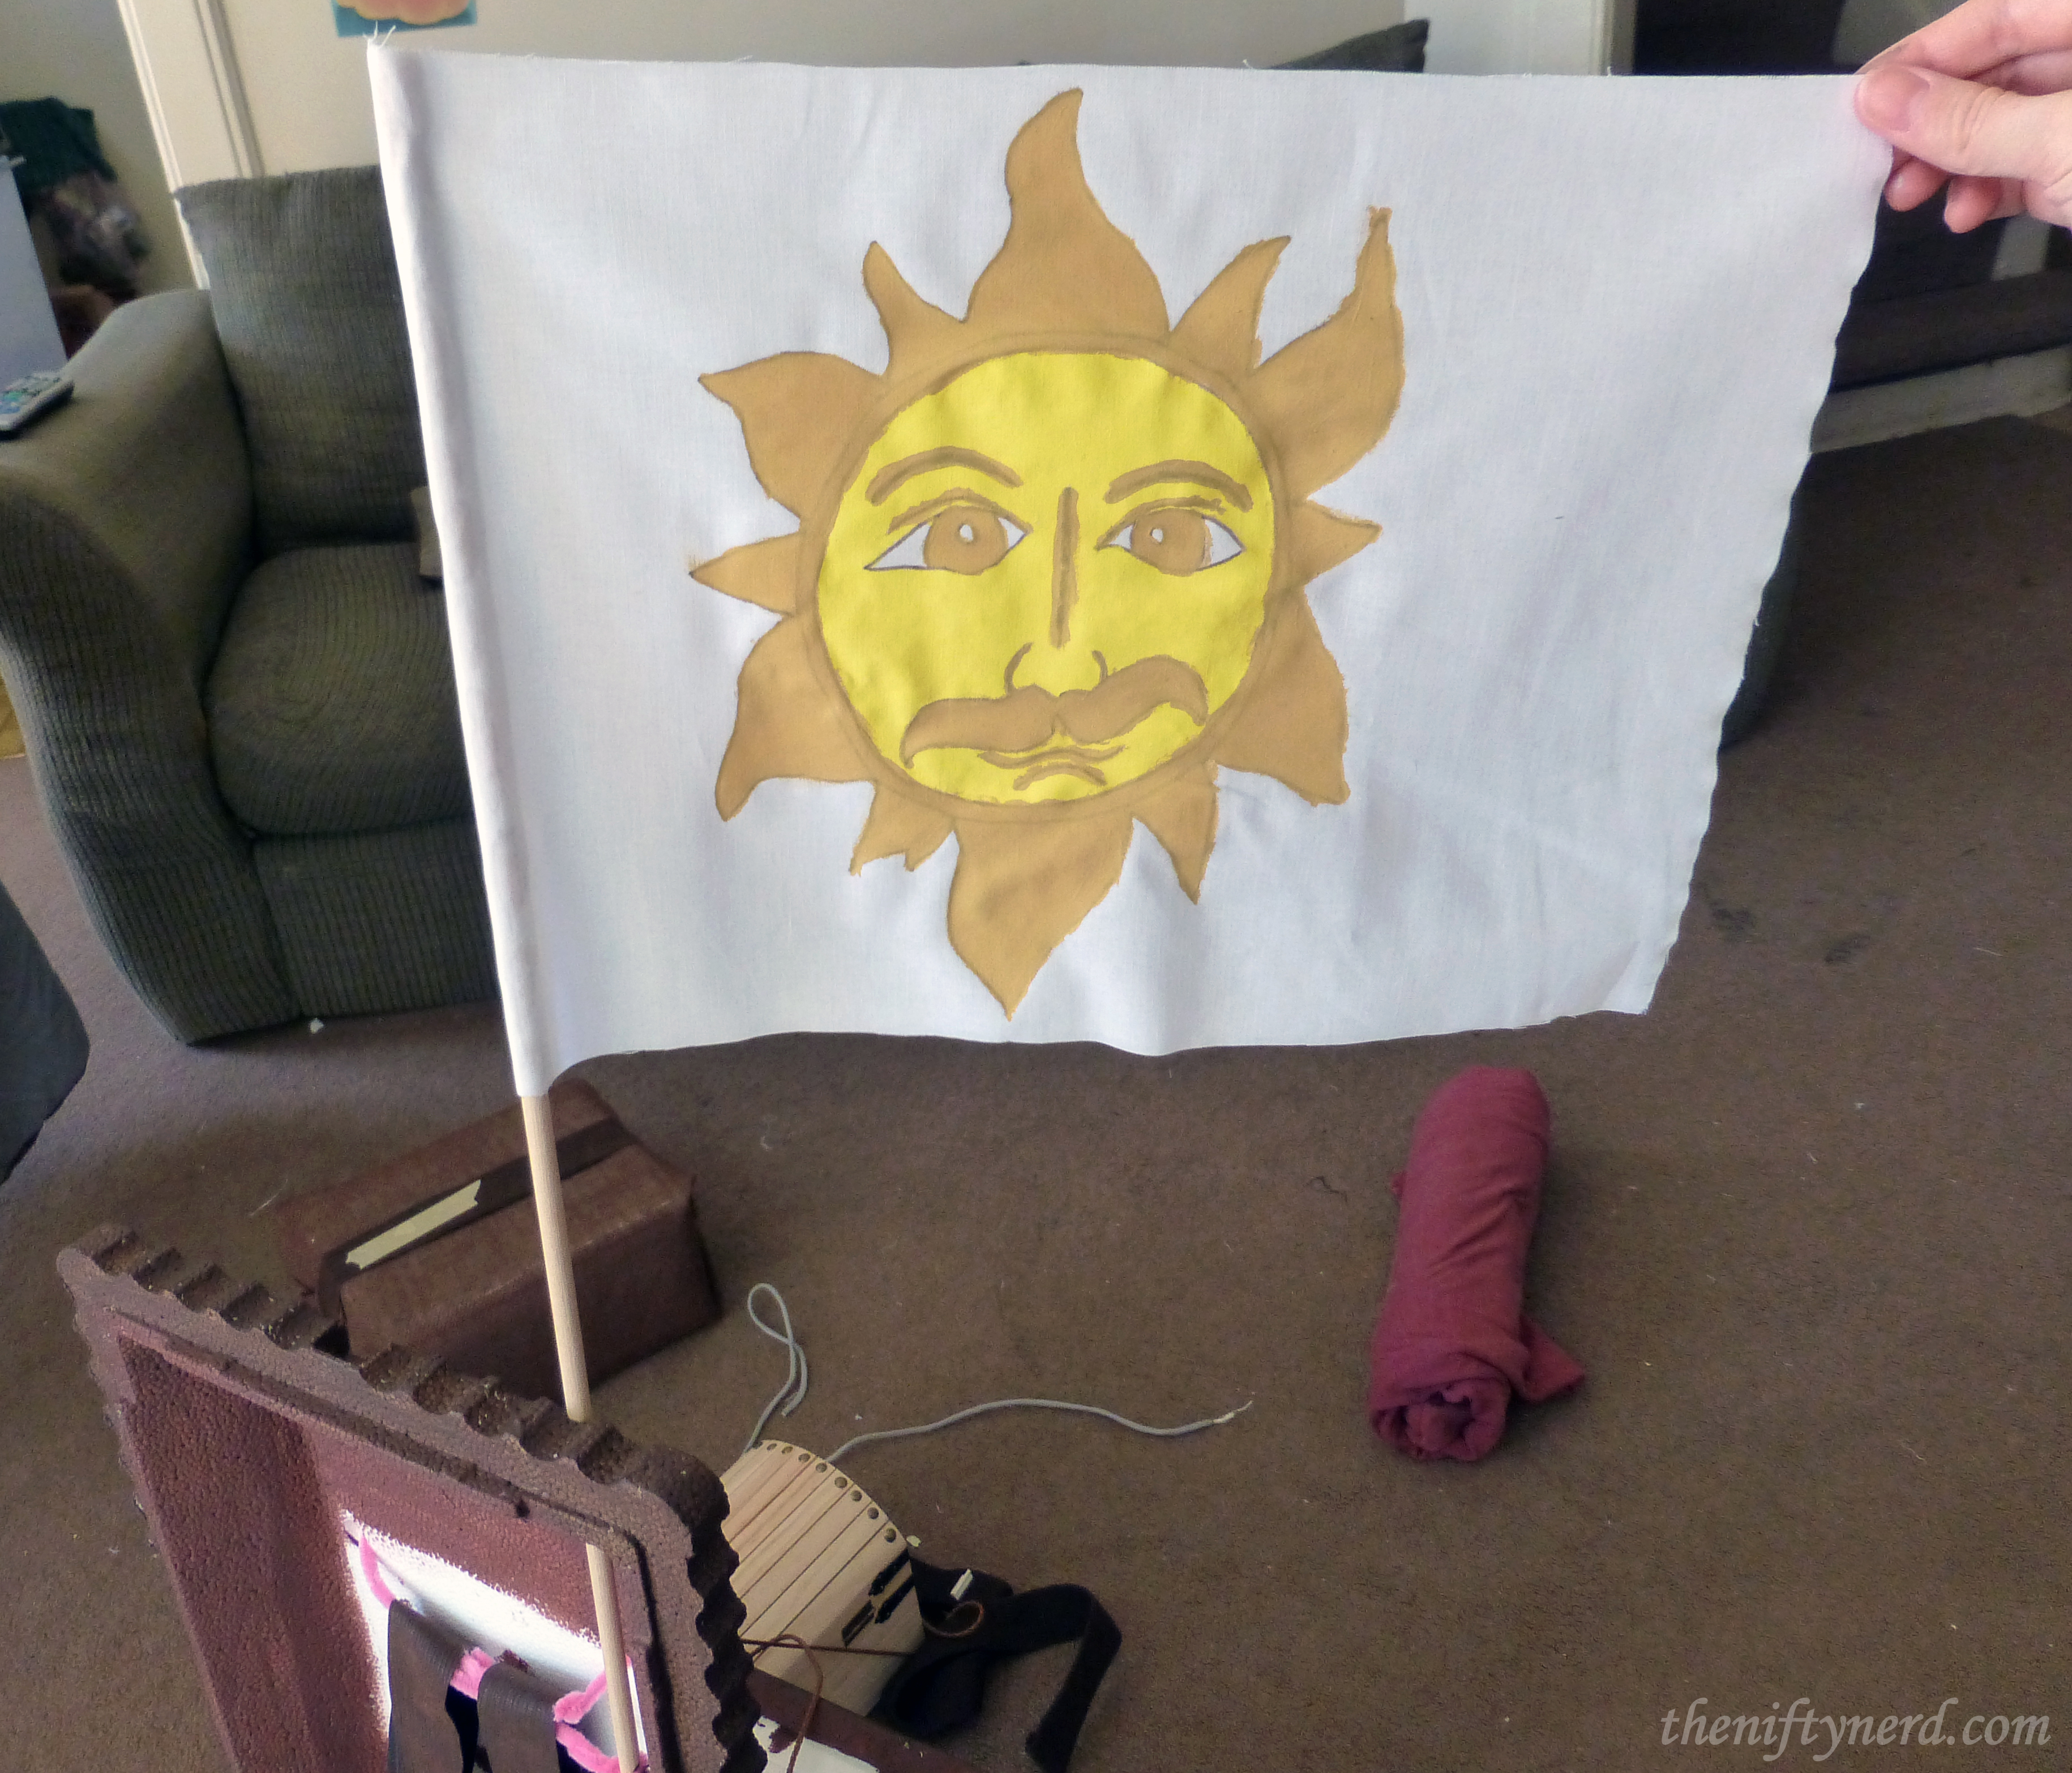 Sun emblem flag